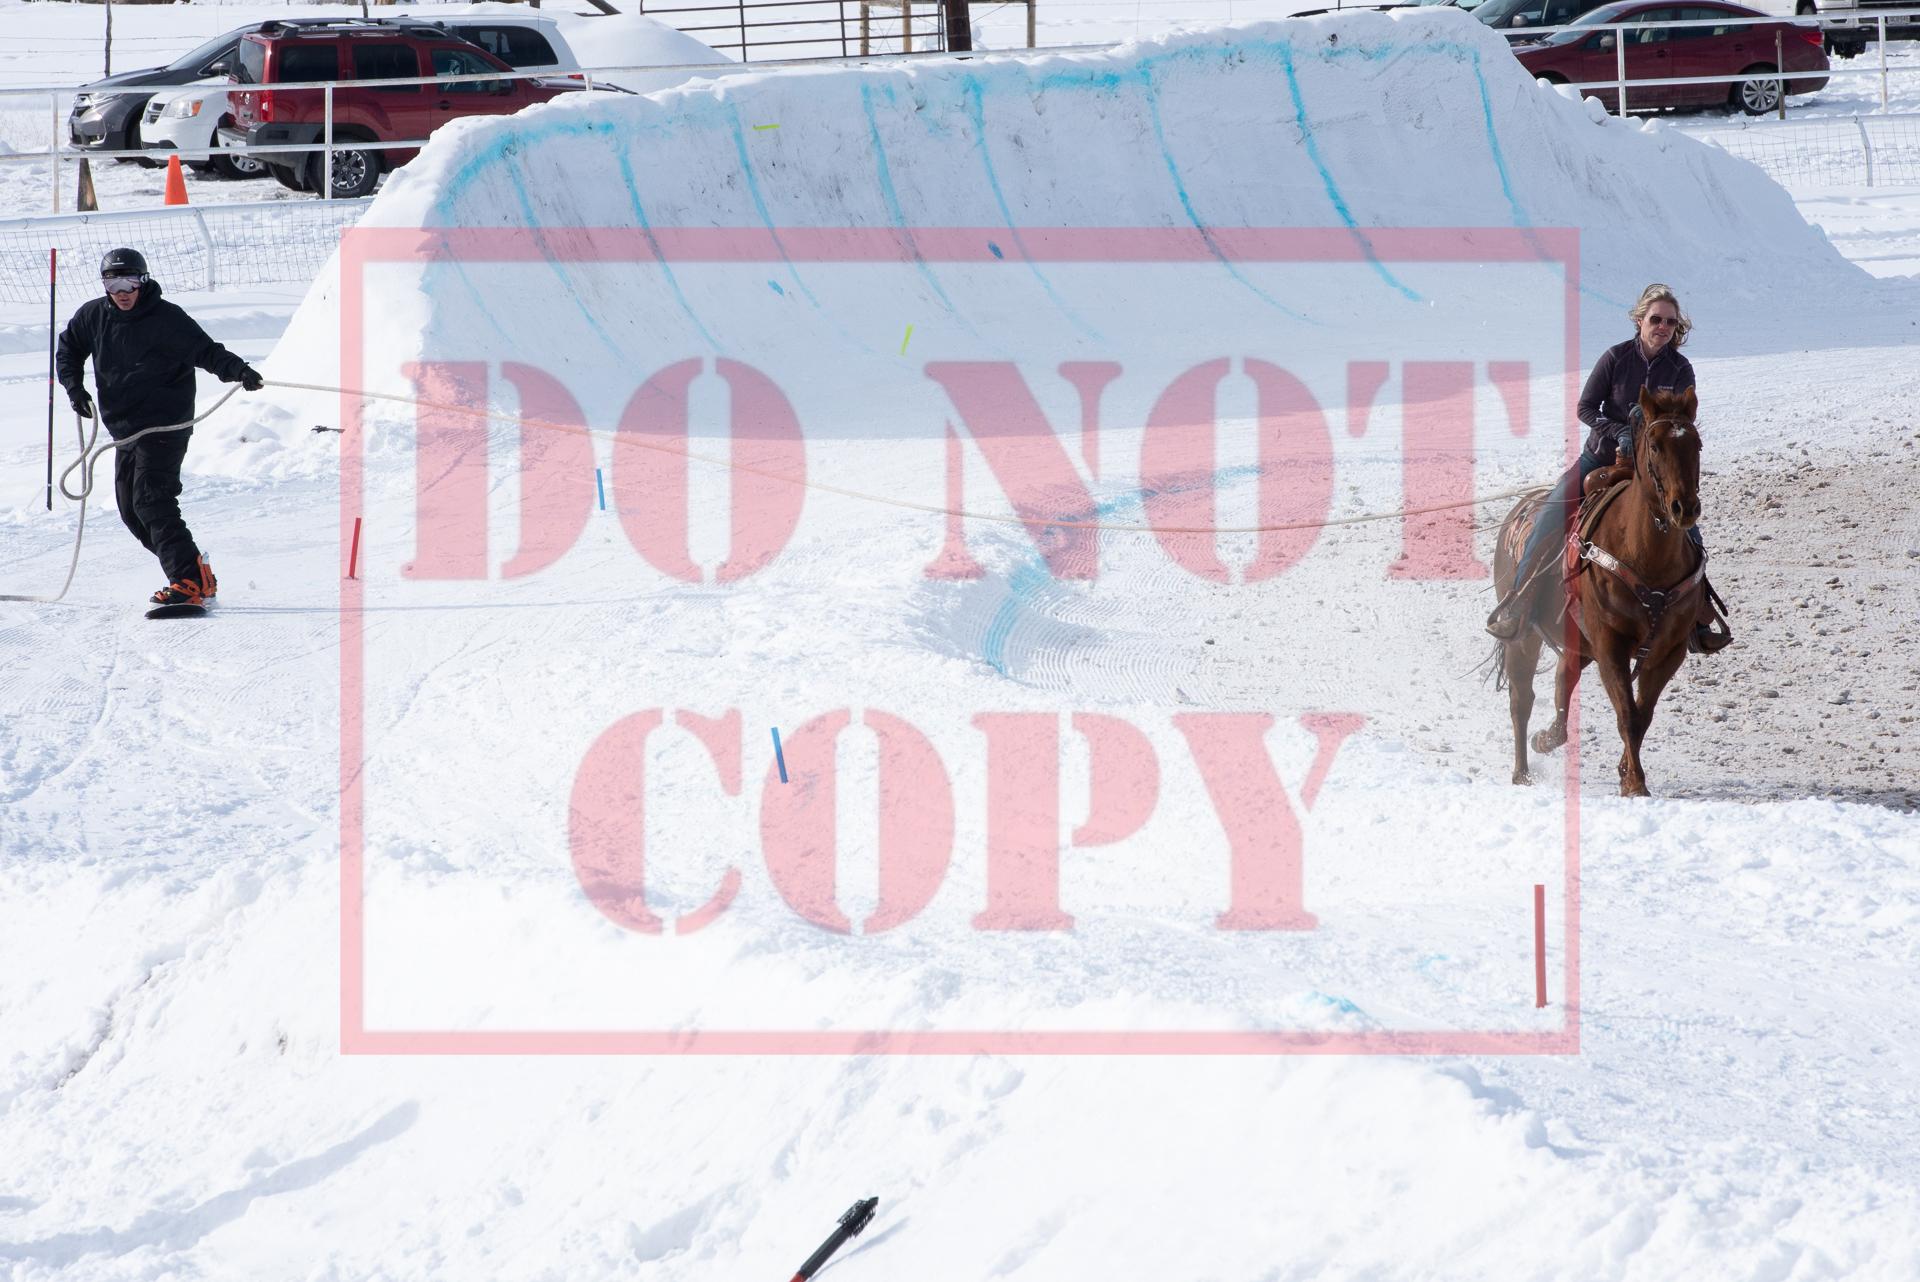 - Amanda Sanders - Snowboard 6